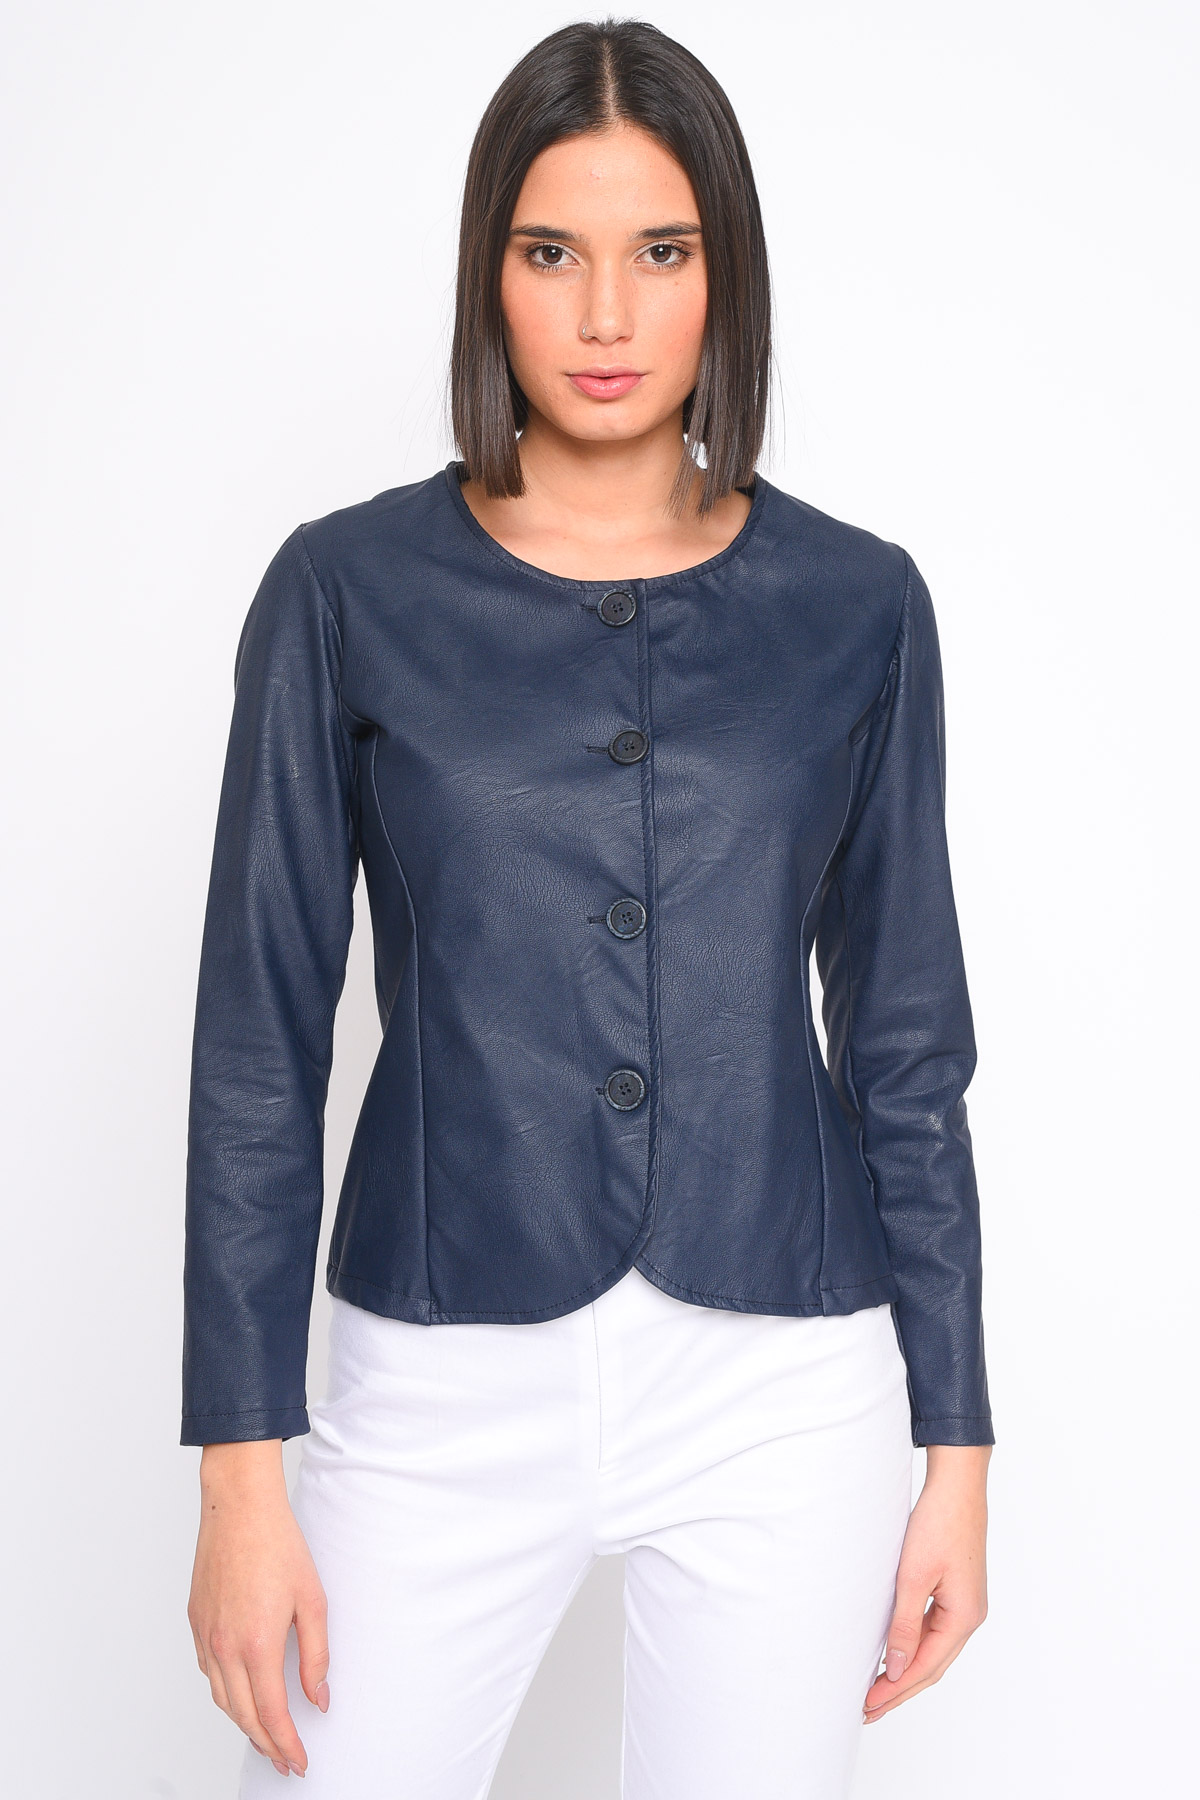 GIACCA CORTA IN ECOPELLE for women - BLUE - Paquito Pronto Moda Shop Online